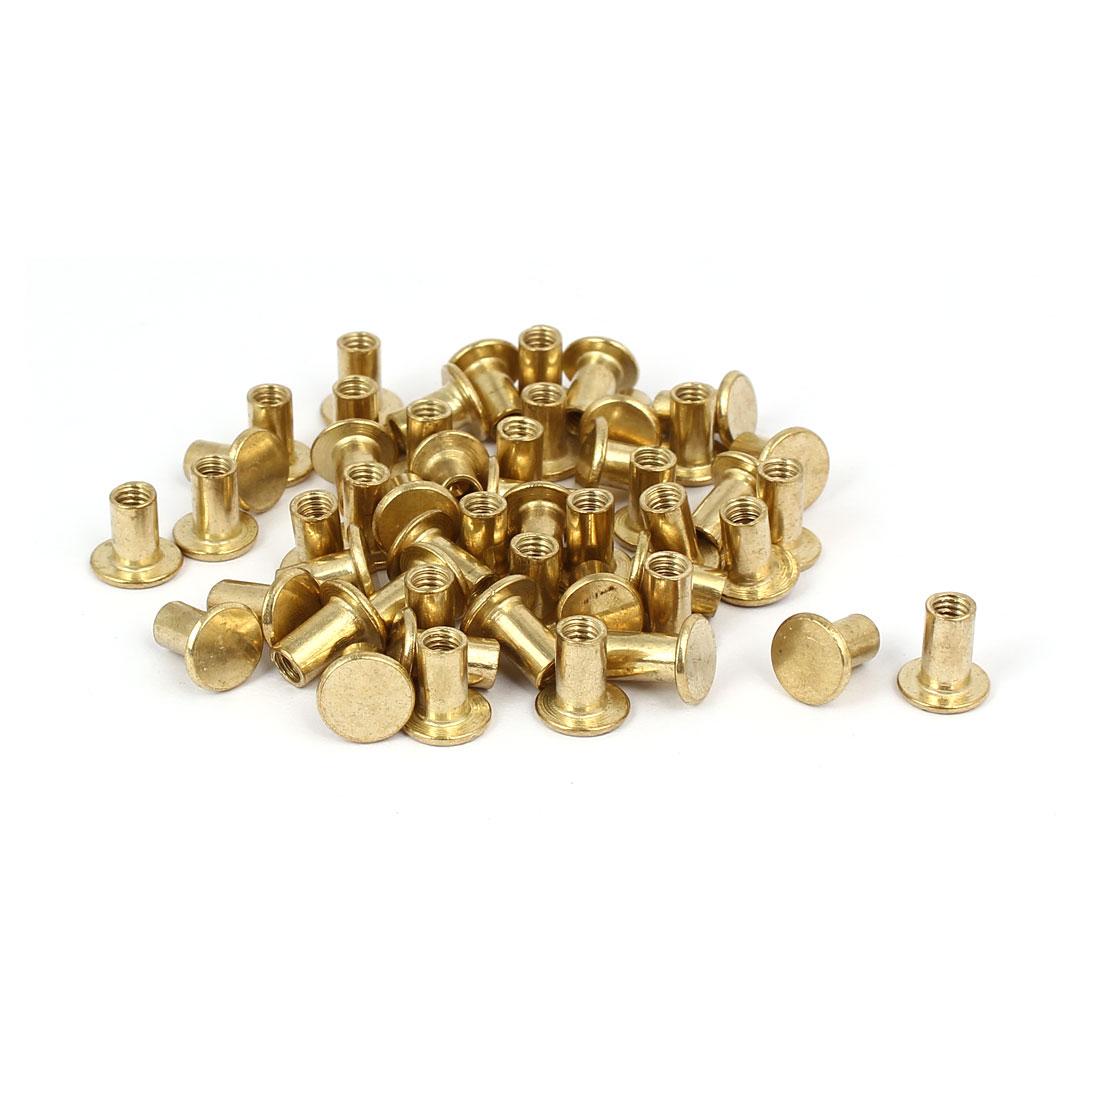 Photo Album Metal Brass Plated Binding Screw Post Barrel Nut 5mmx8mm 50pcs